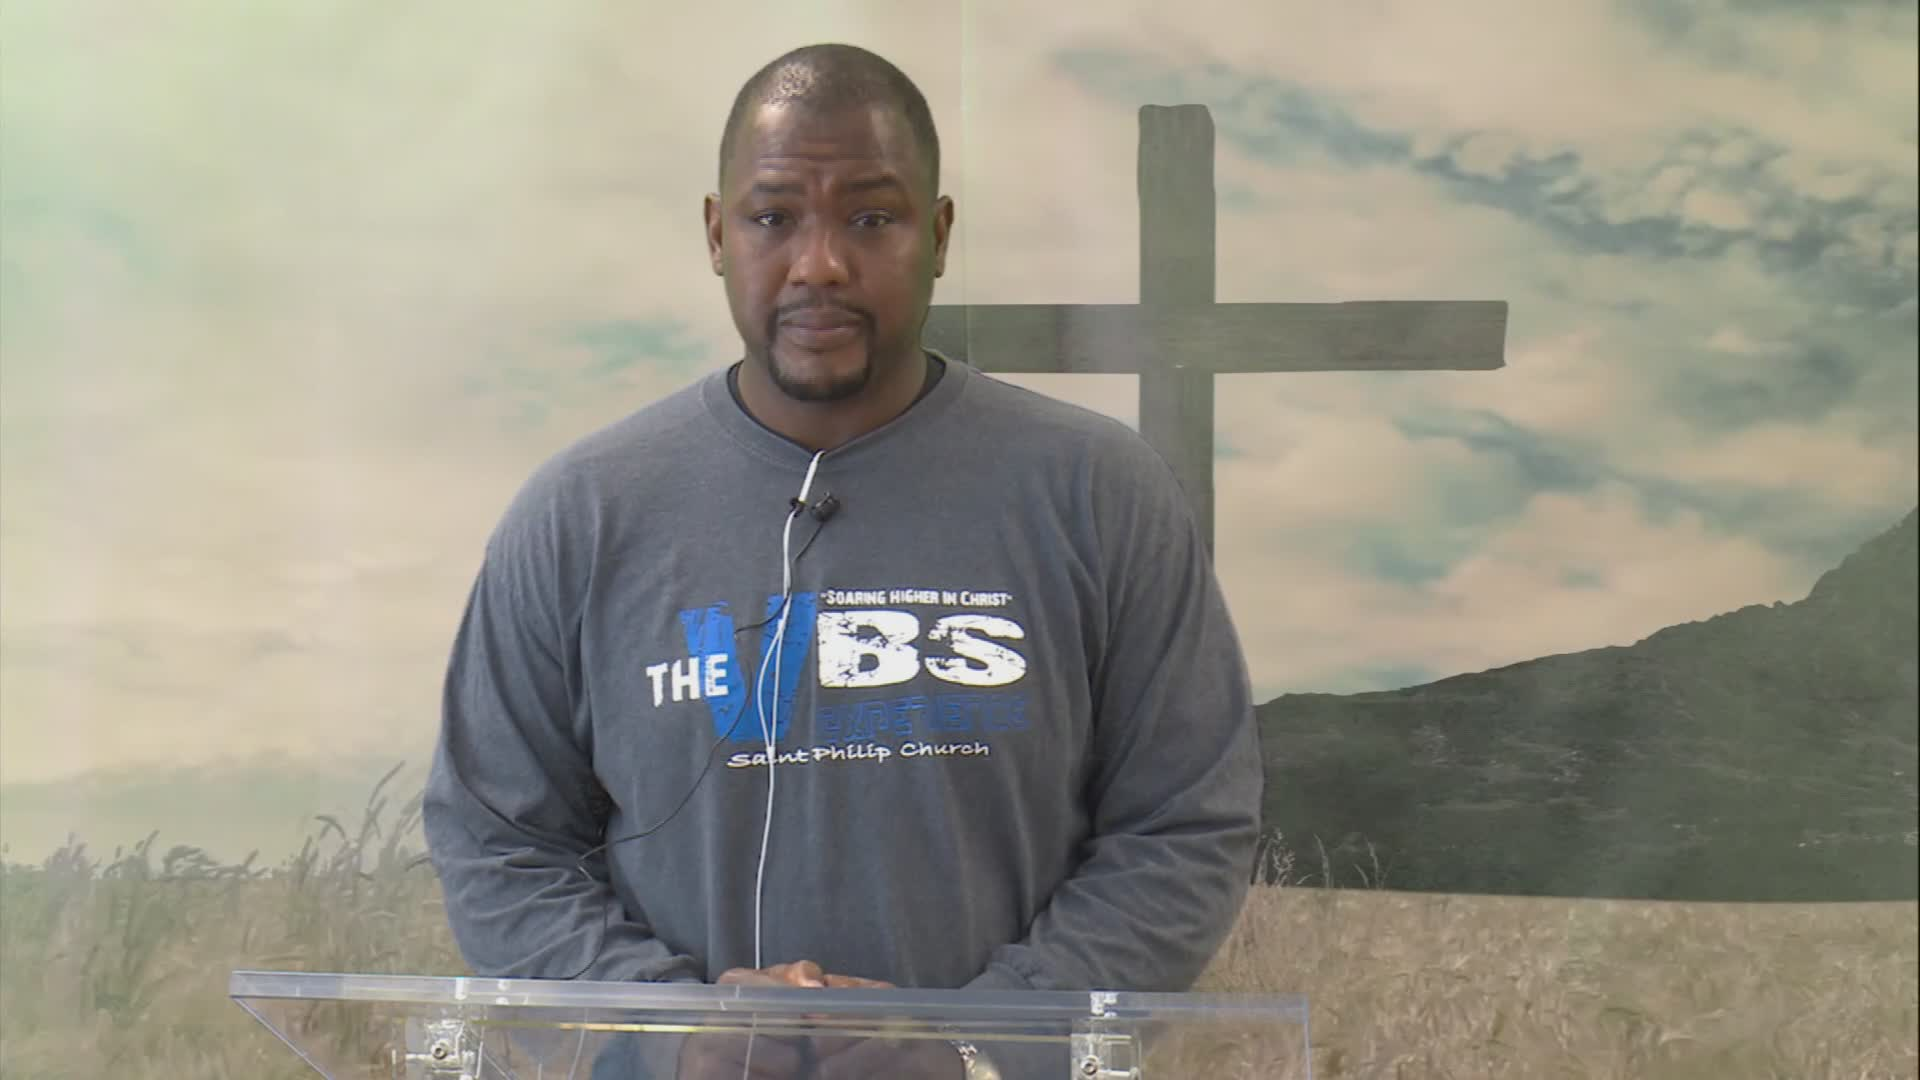 Saint Philip African Methodist Episcopal Church on 04-Nov-20-03:00:07